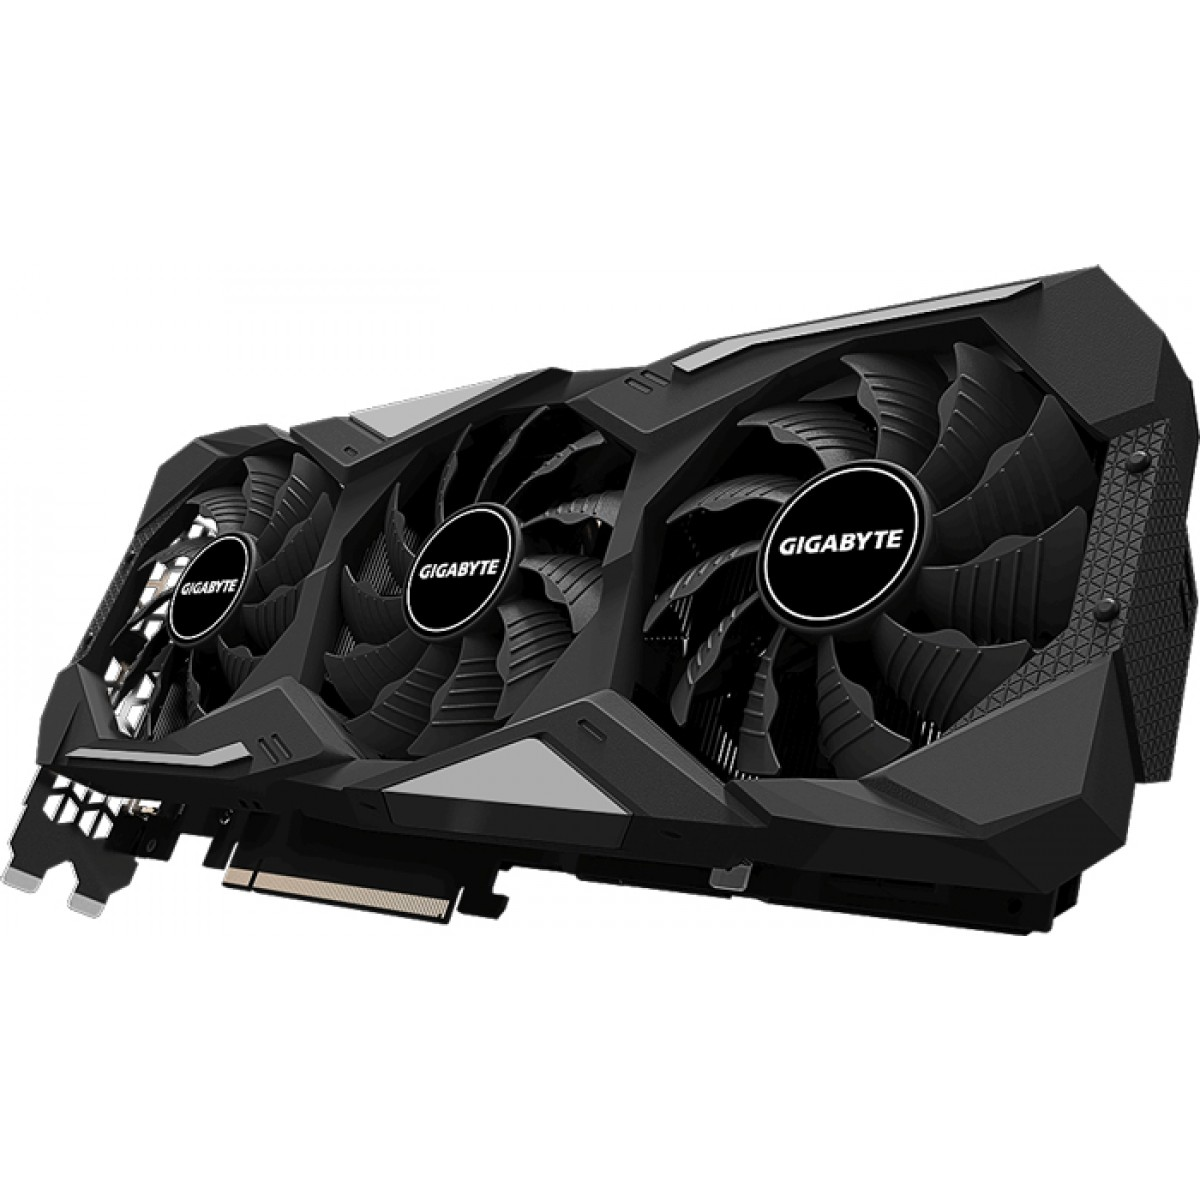 Placa de Vídeo Gigabyte GeForce RTX 2070 Super Gaming OC 3X, 8GB GDDR6, 256Bit, GV-N207SGAMING OC-8GD